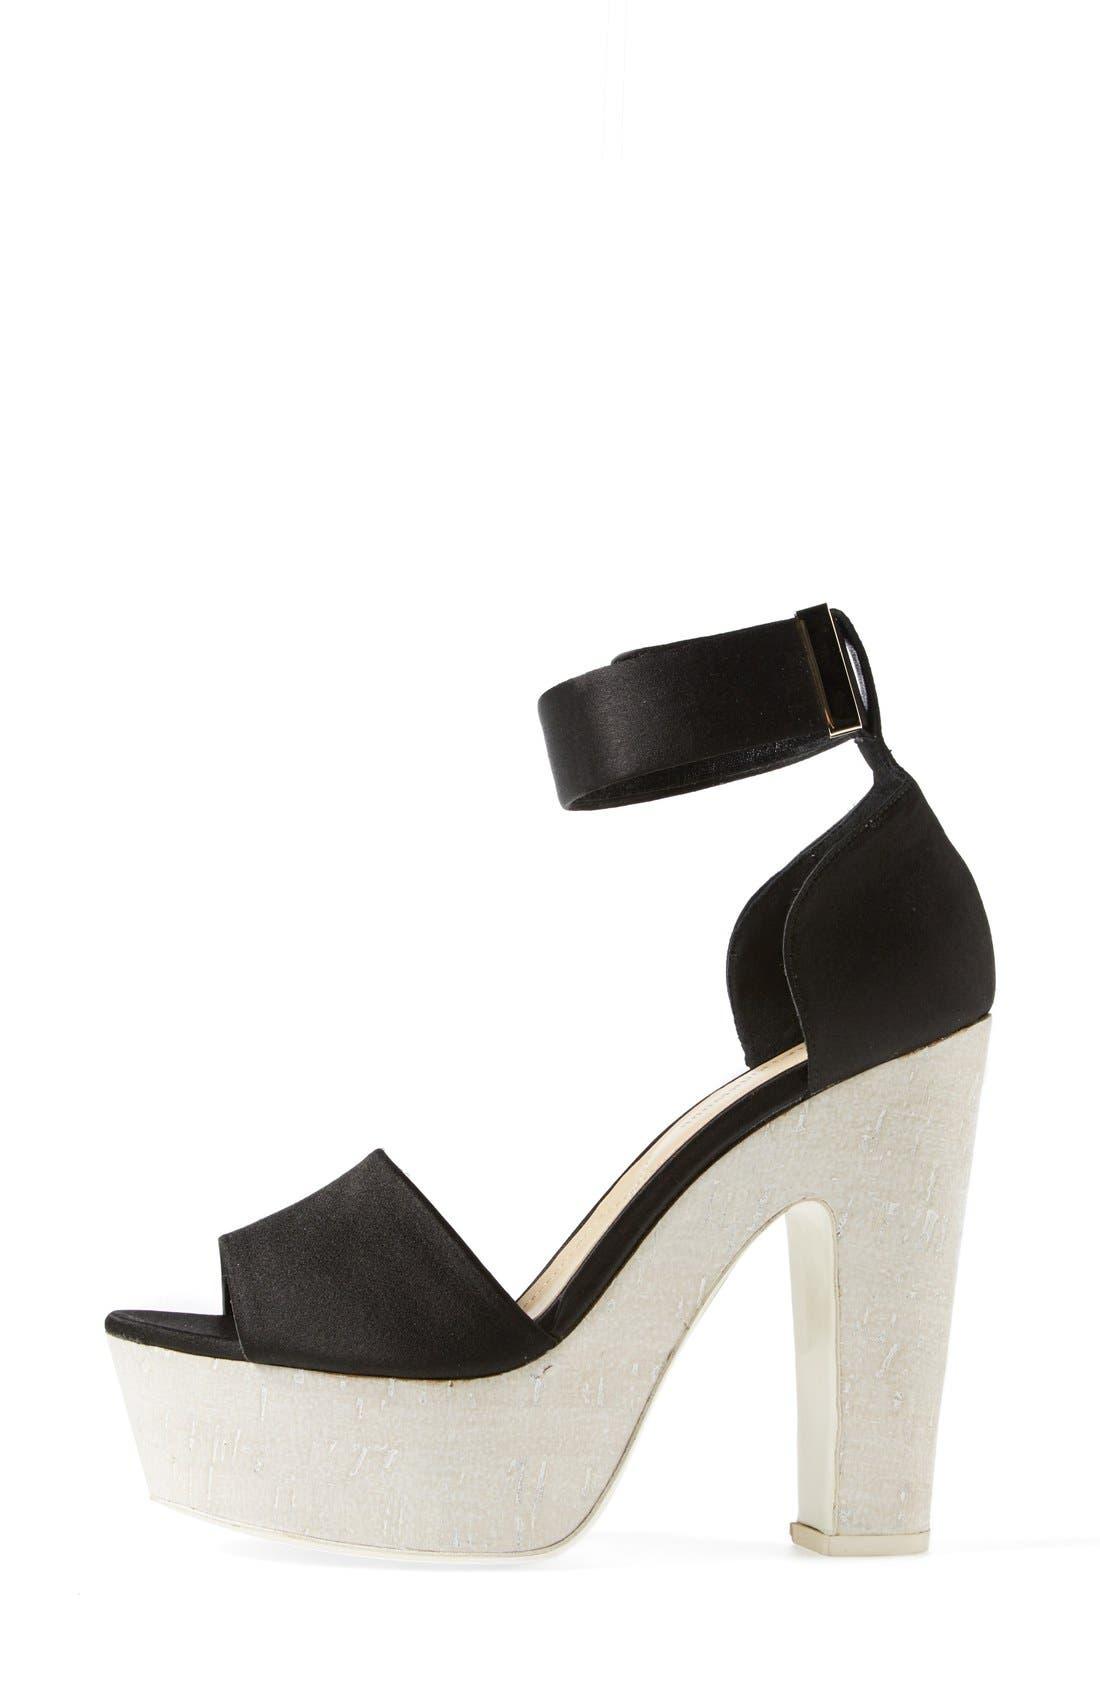 'Pearl' Platform Ankle Strap Sandal,                             Alternate thumbnail 4, color,                             Black